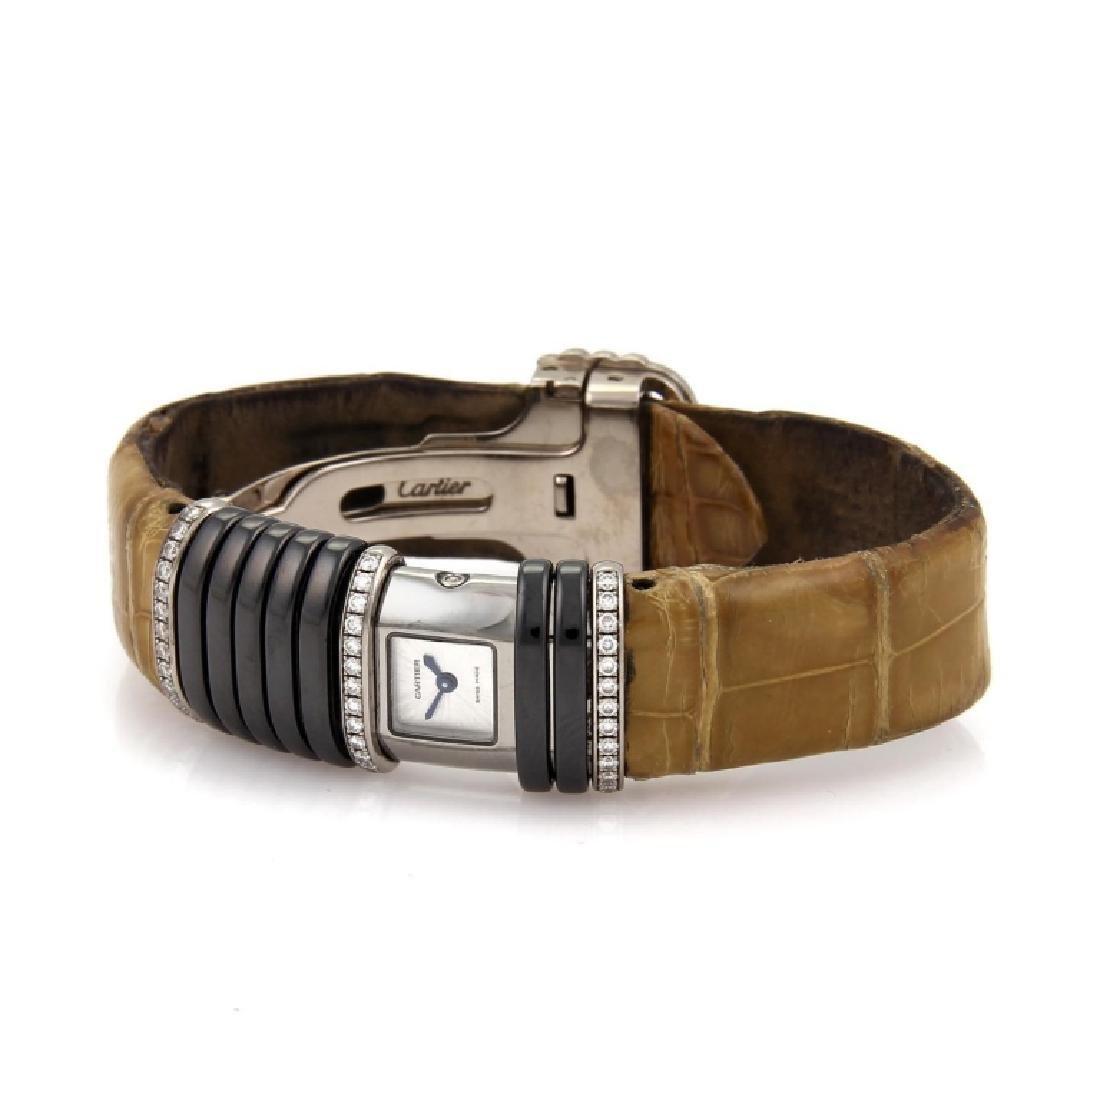 Cartier Diamond Titanium 18k Gold Leather Watch